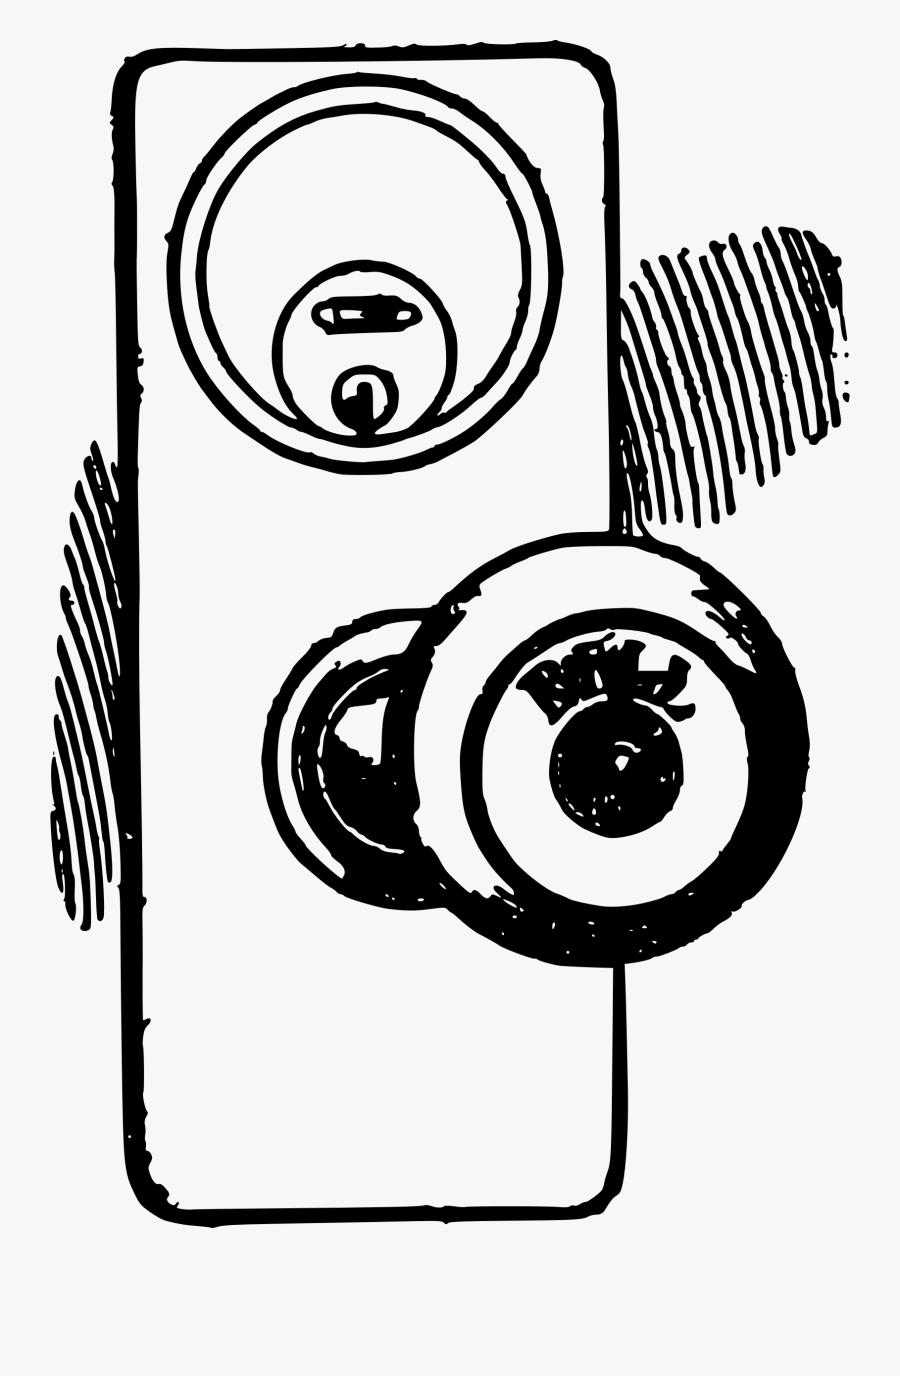 Hd Image Transparent Download Door Black And White - Lock Door Clip Art Black And White, Transparent Clipart